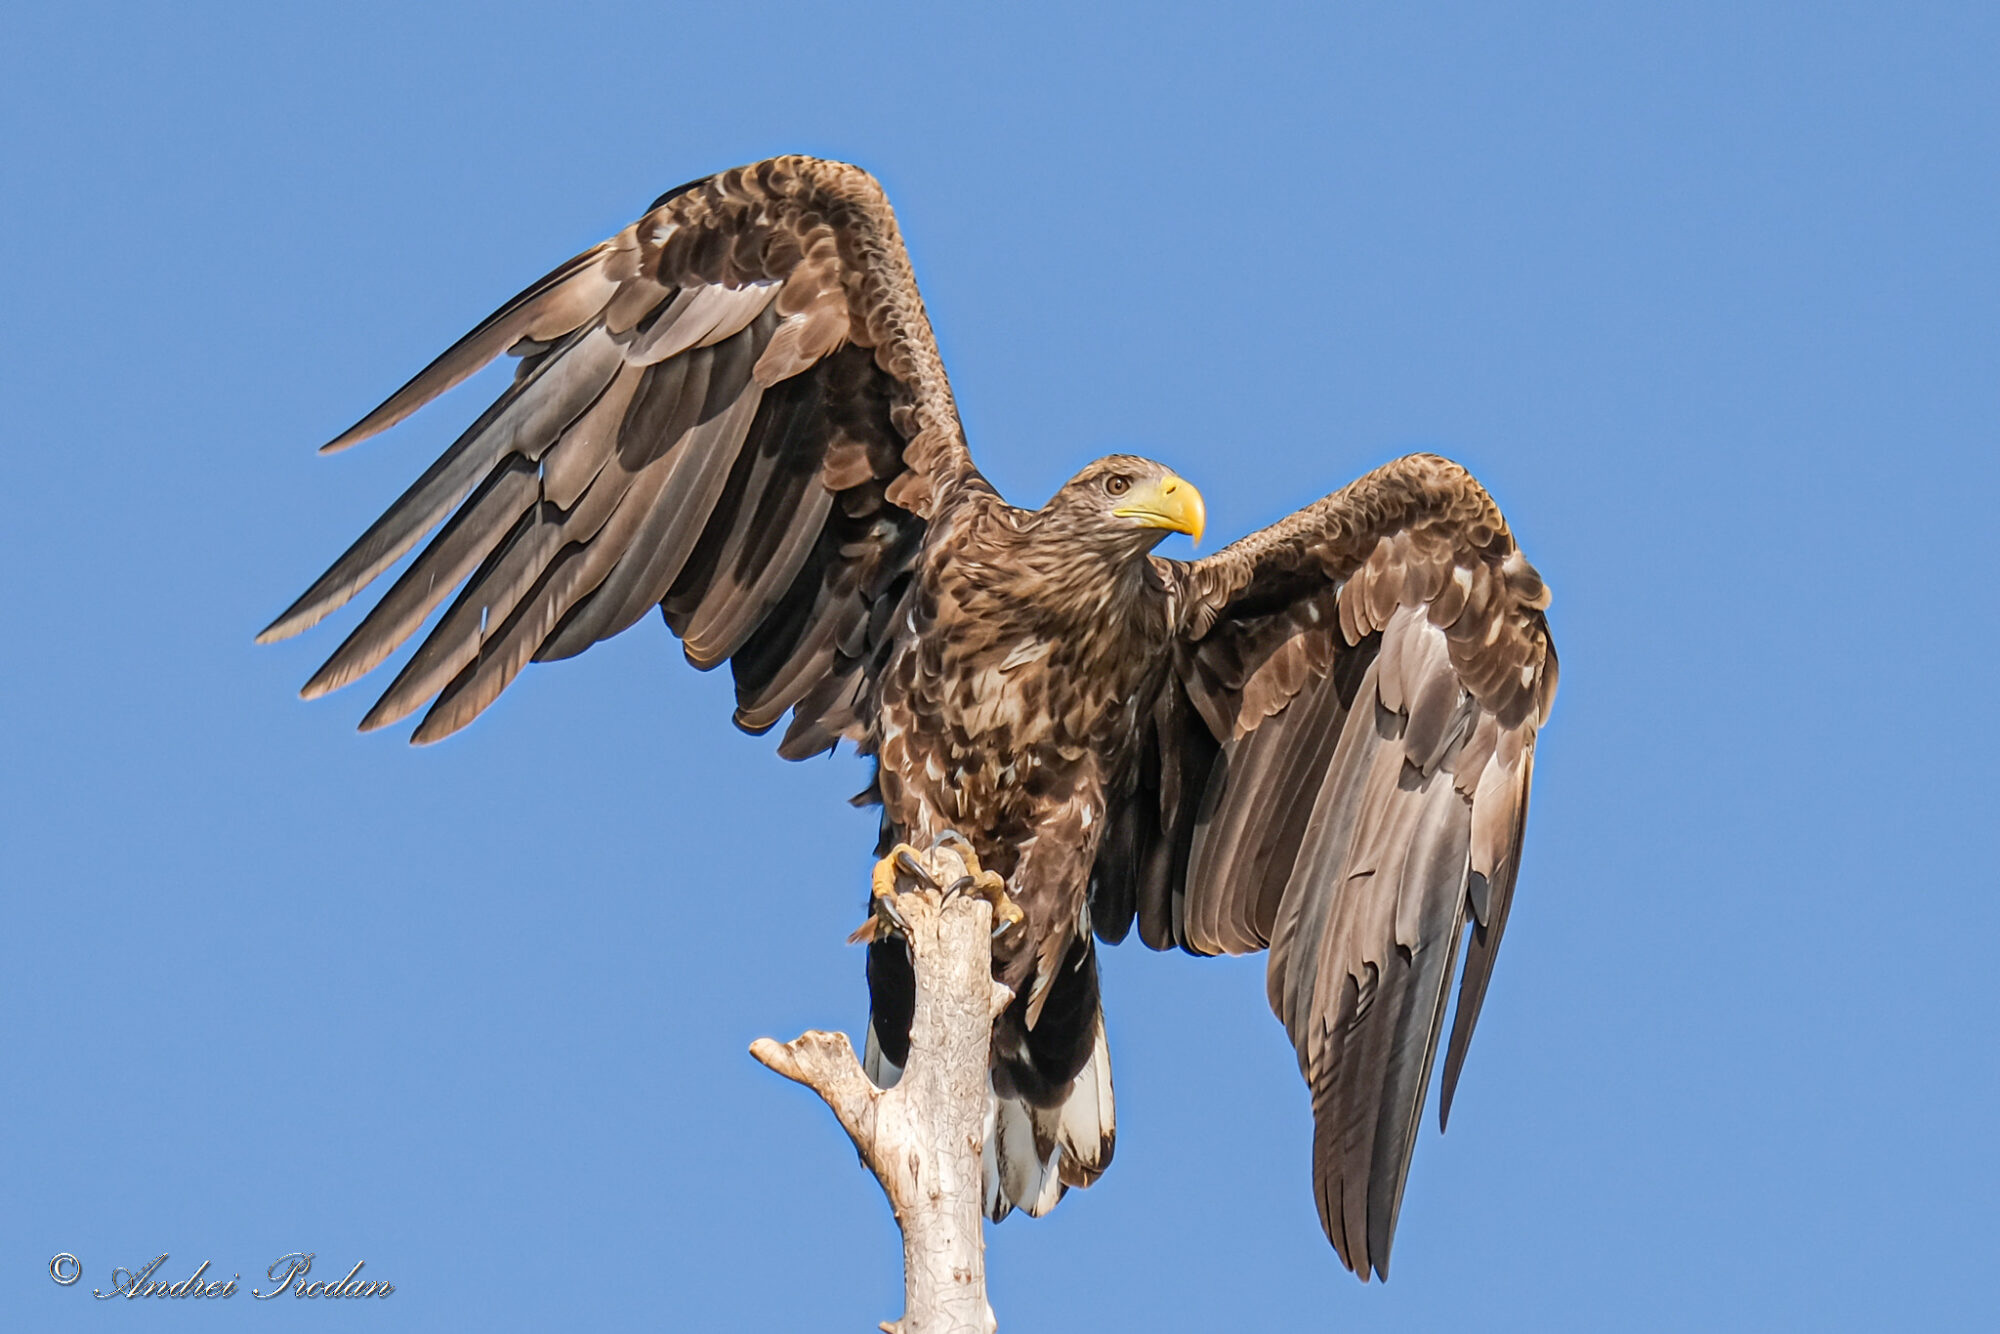 White-tailed eagle - Codalb - Haliaeetus albicilla